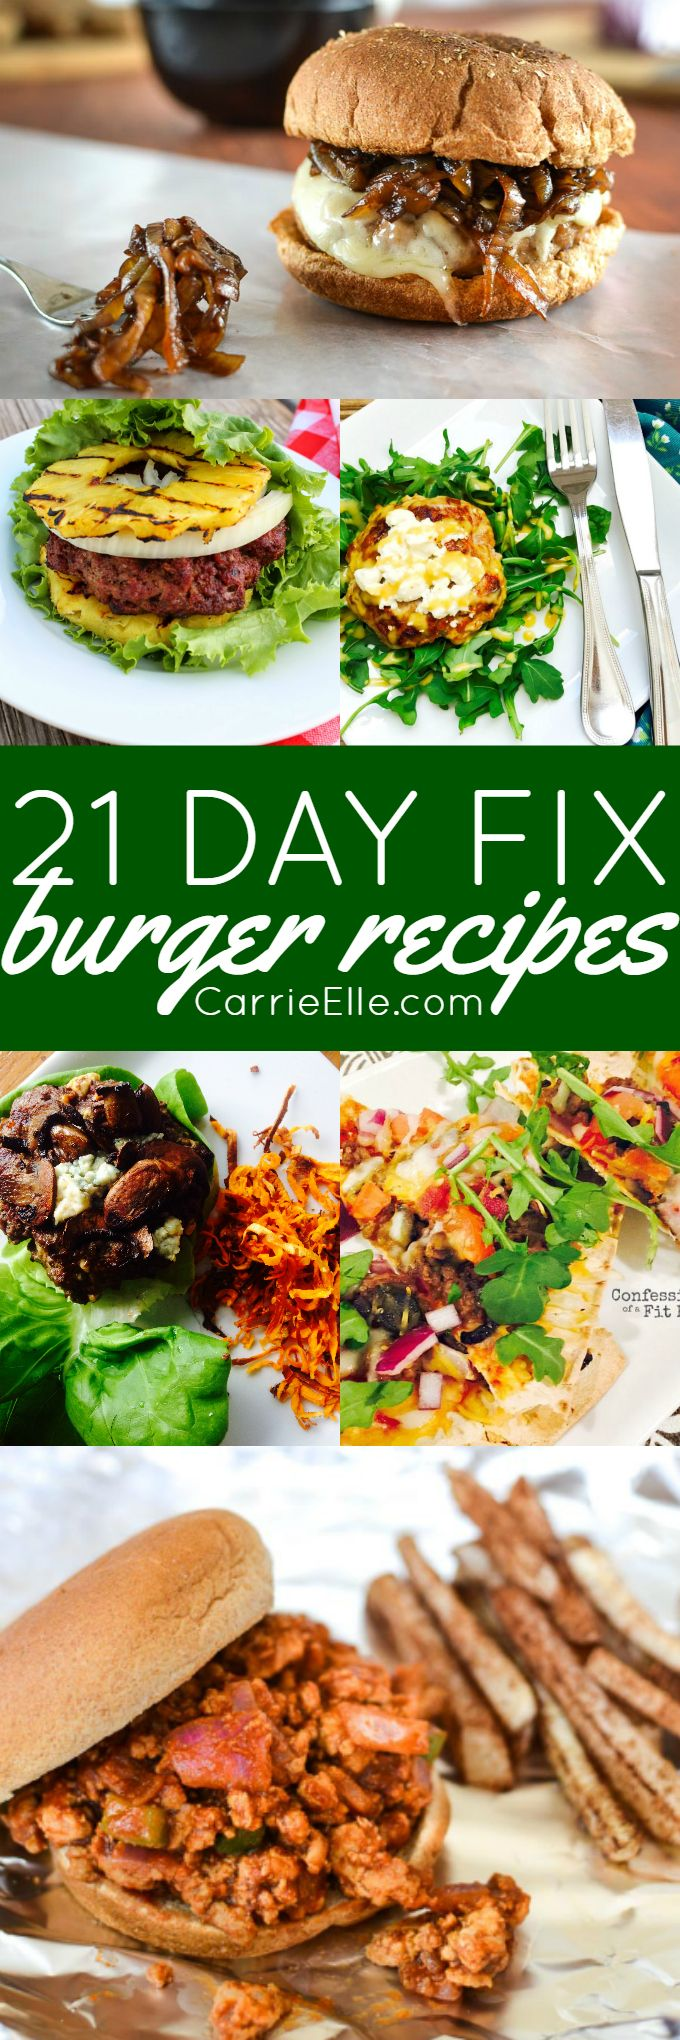 21 Day Fix Burger Recipes via @carrieelleblog